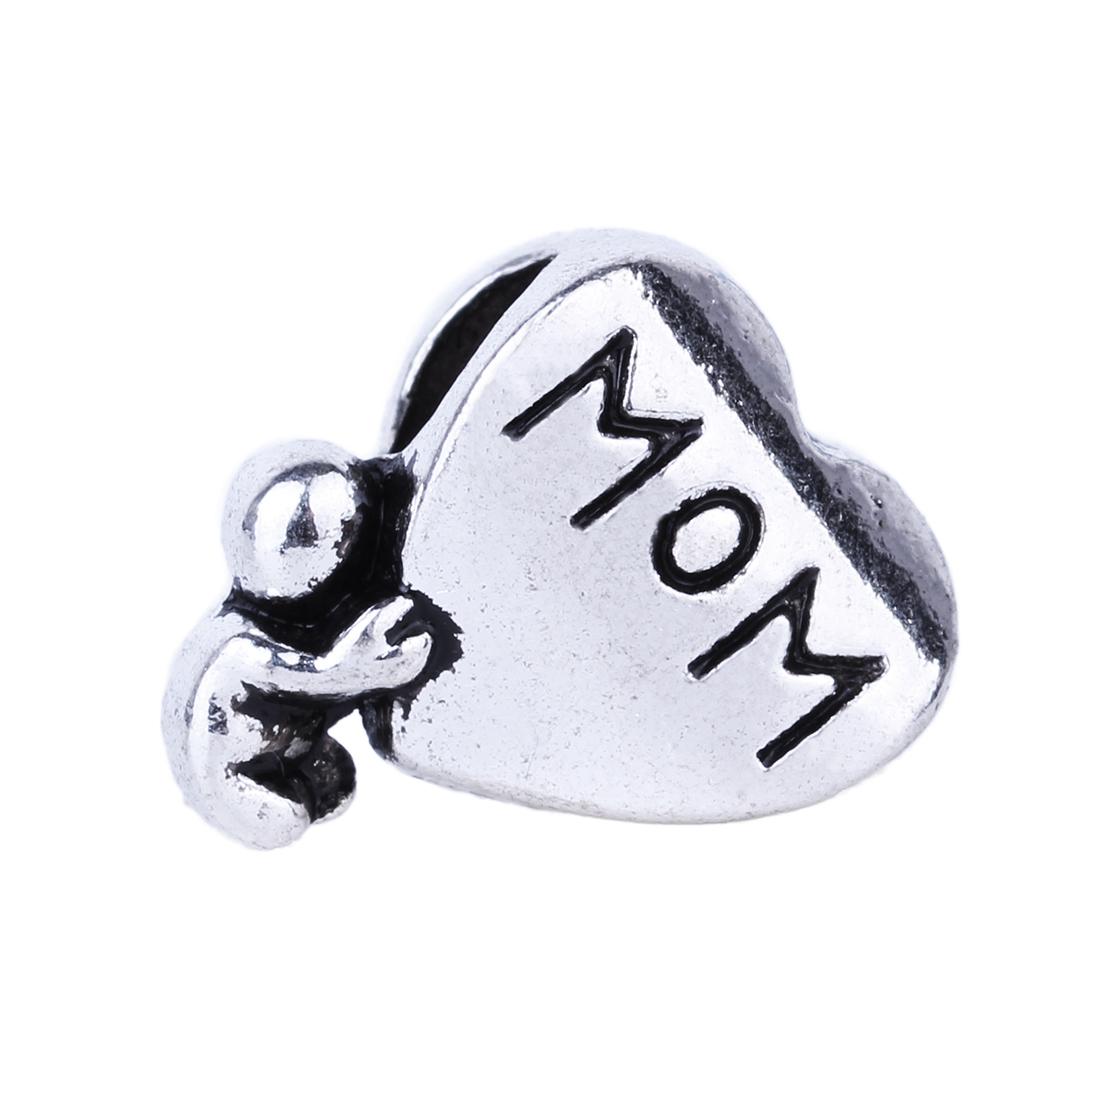 Free Shipping 1pc Silver Mom Heart Alloy Bead DIY European Big Hole Beads Fits Charm Pandora